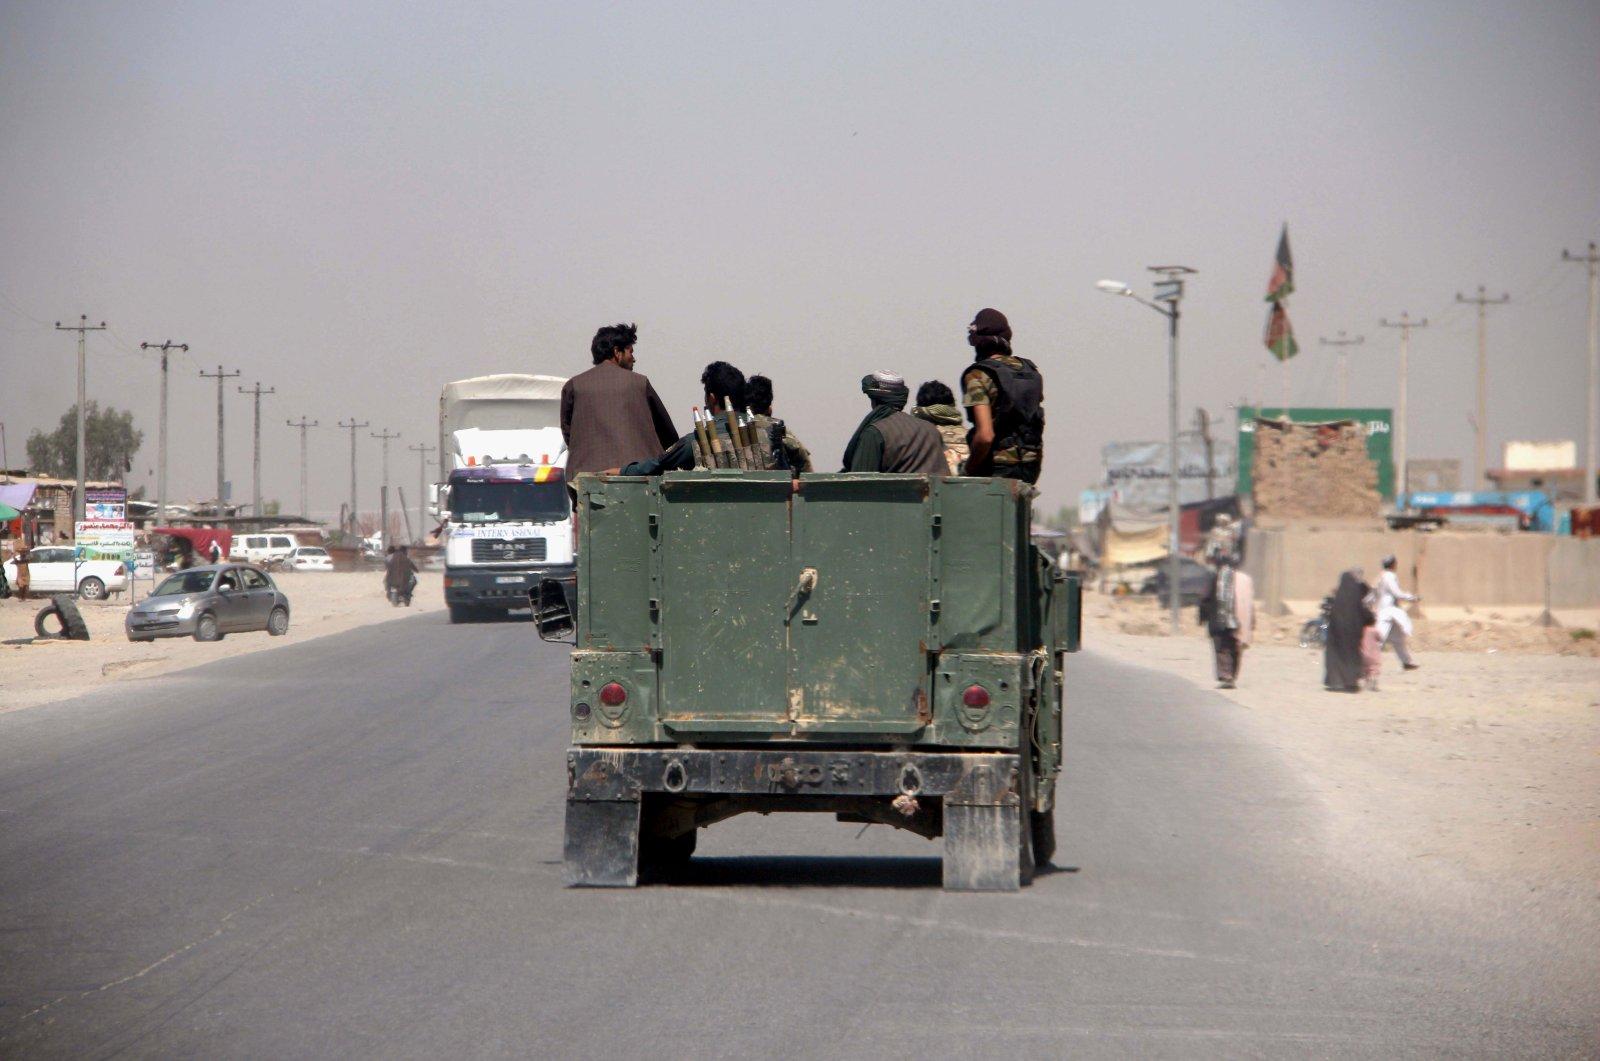 Afghan security officials patrol on a highway in Helmand, Afghanistan, June 14, 2020. (EPA Photo)